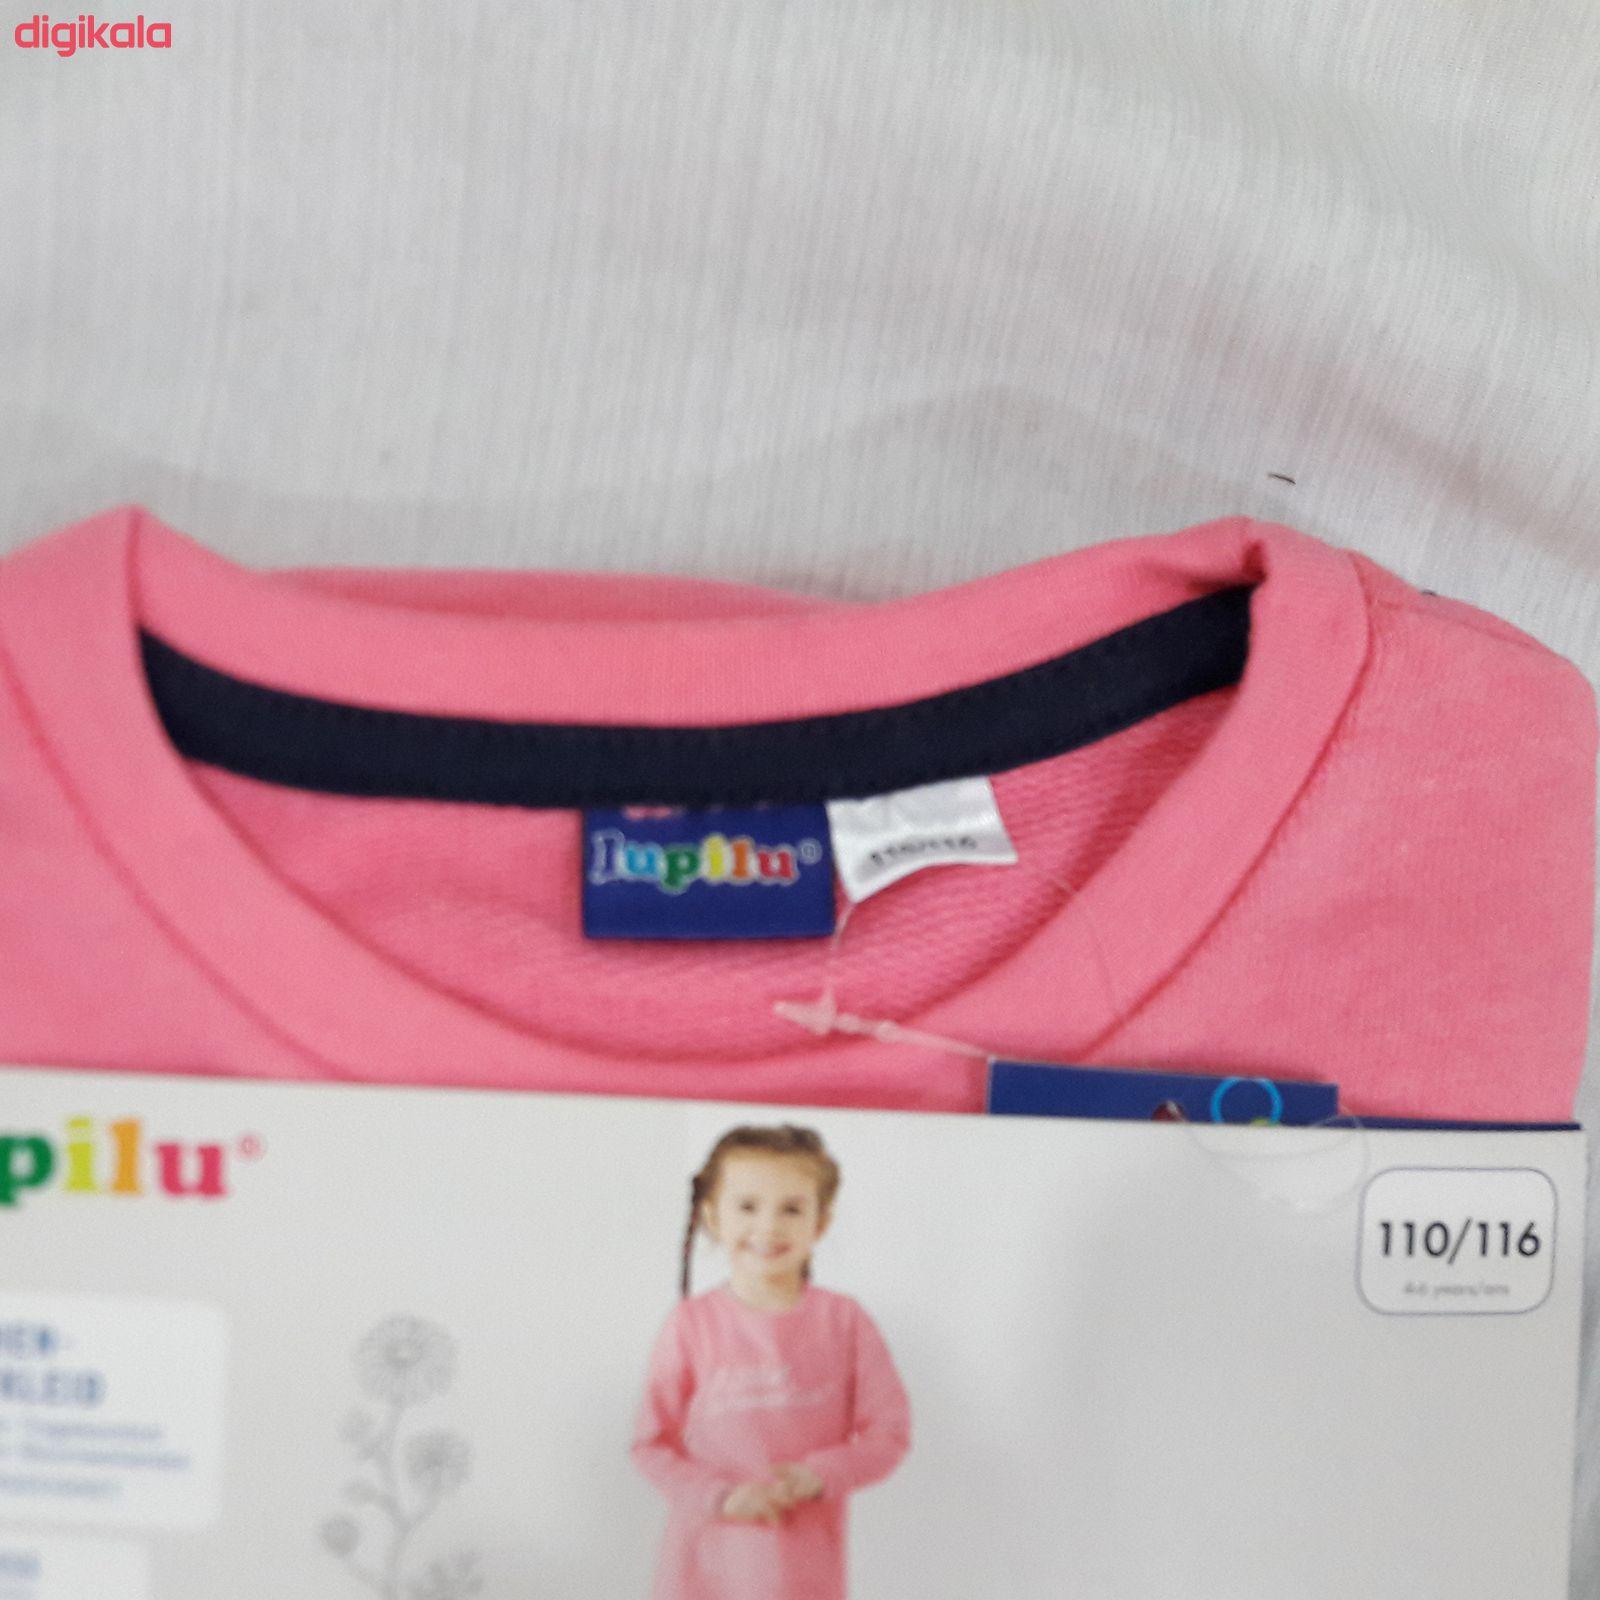 پیراهن دخترانه لوپیلو کد lusb029 main 1 1